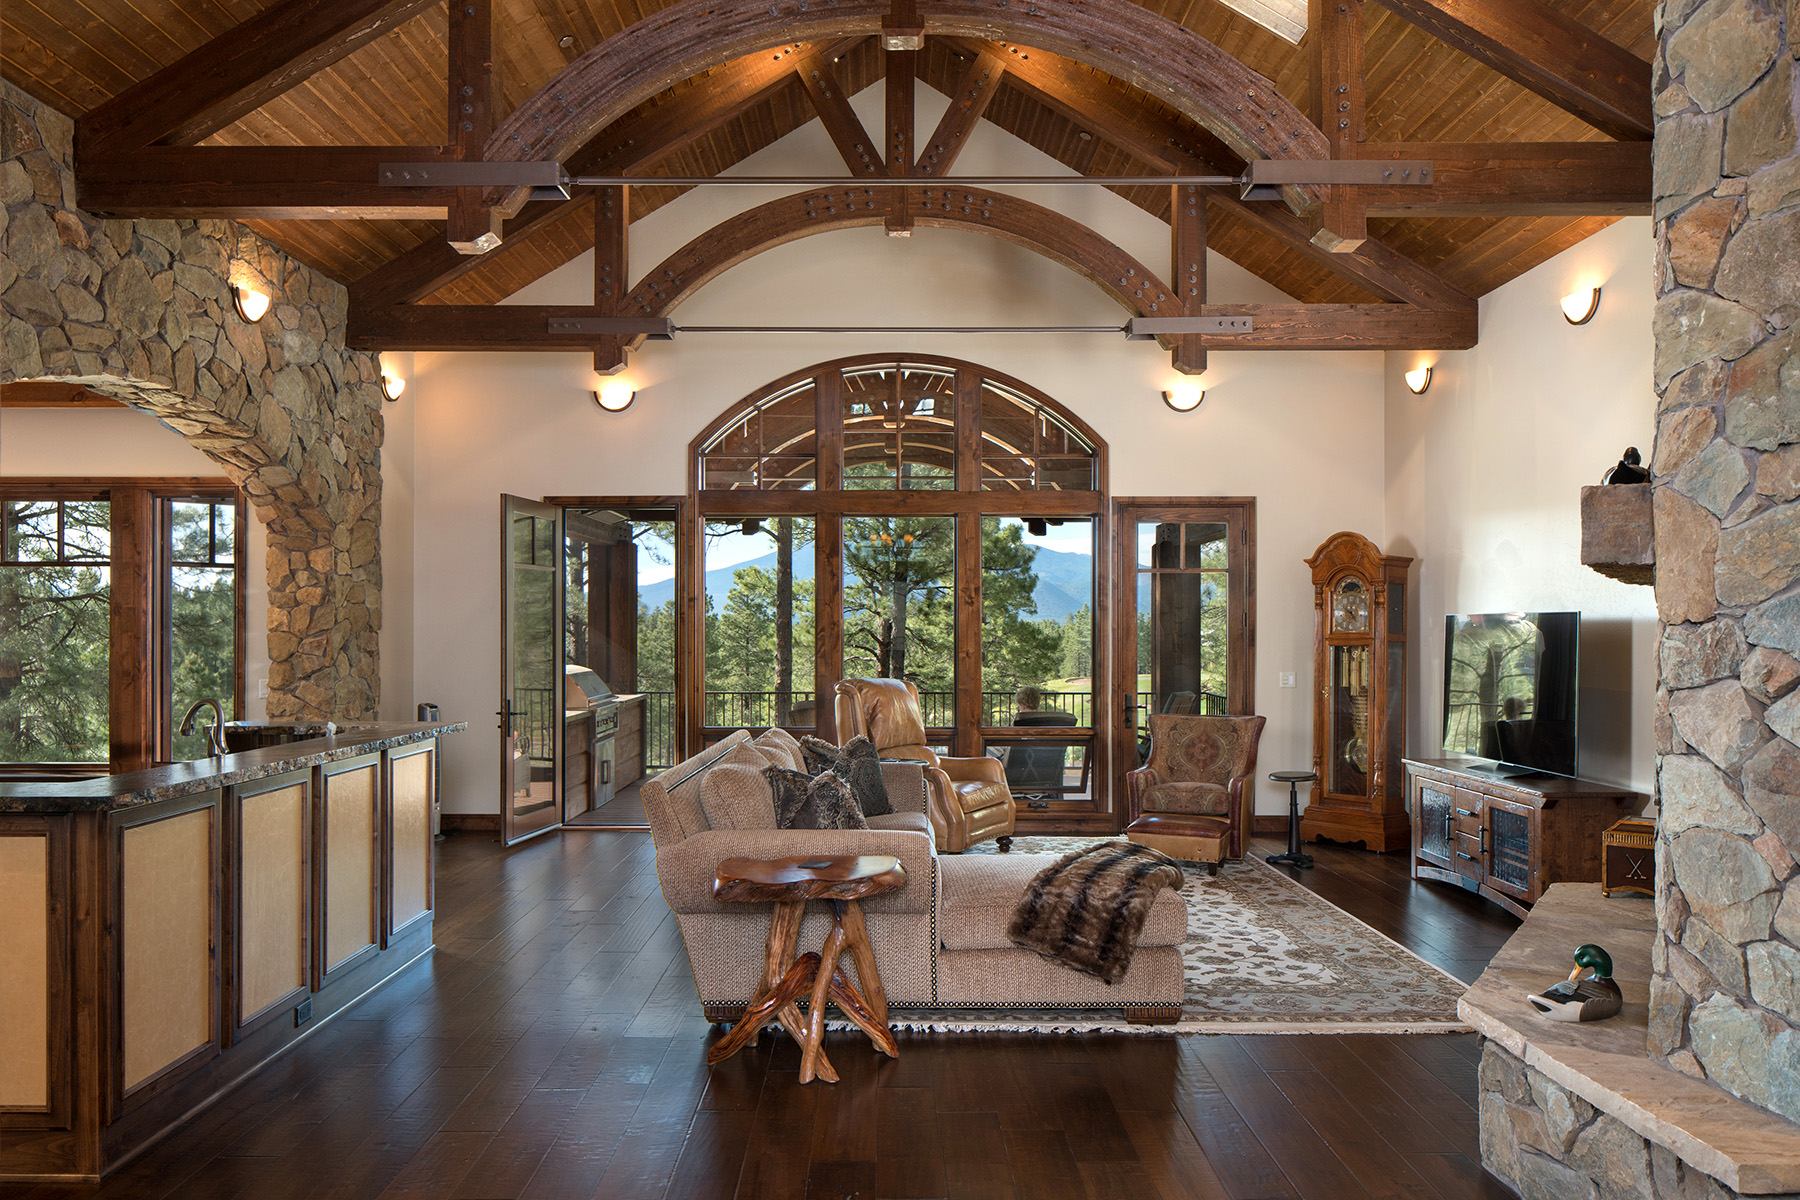 Arizona Living Room interior design by J White Designs